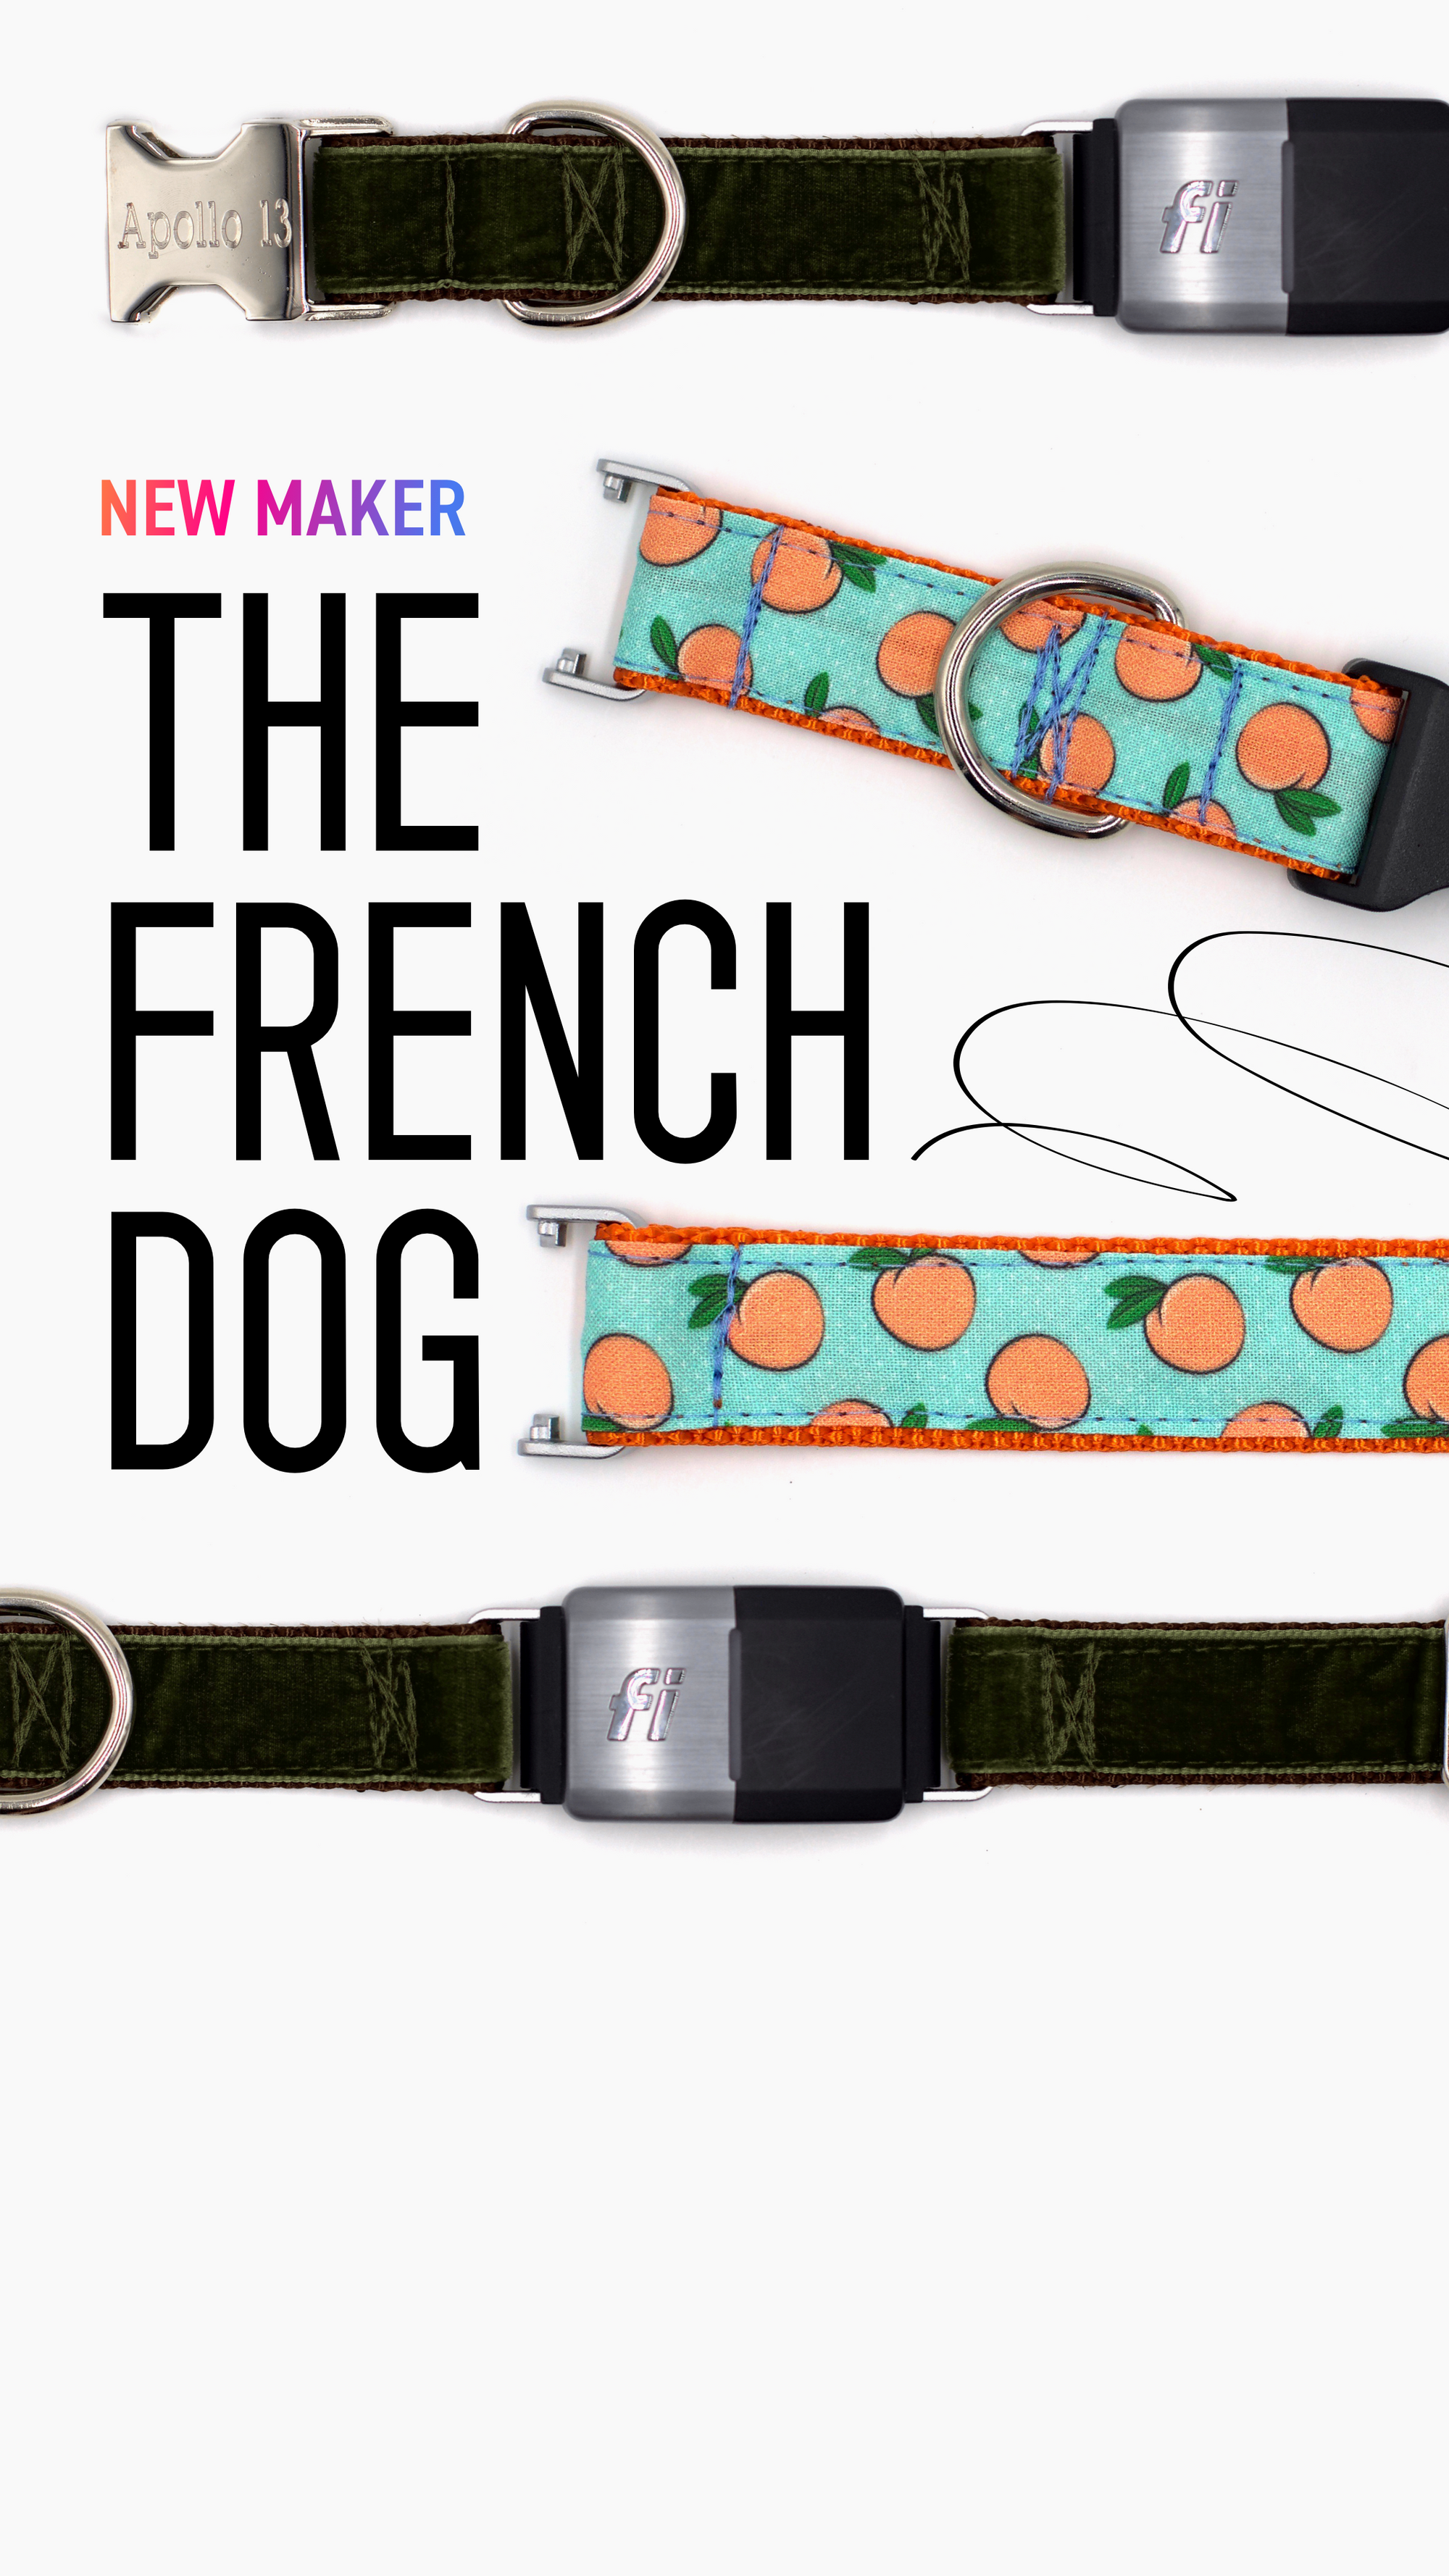 New Maker Alert: The French Dog